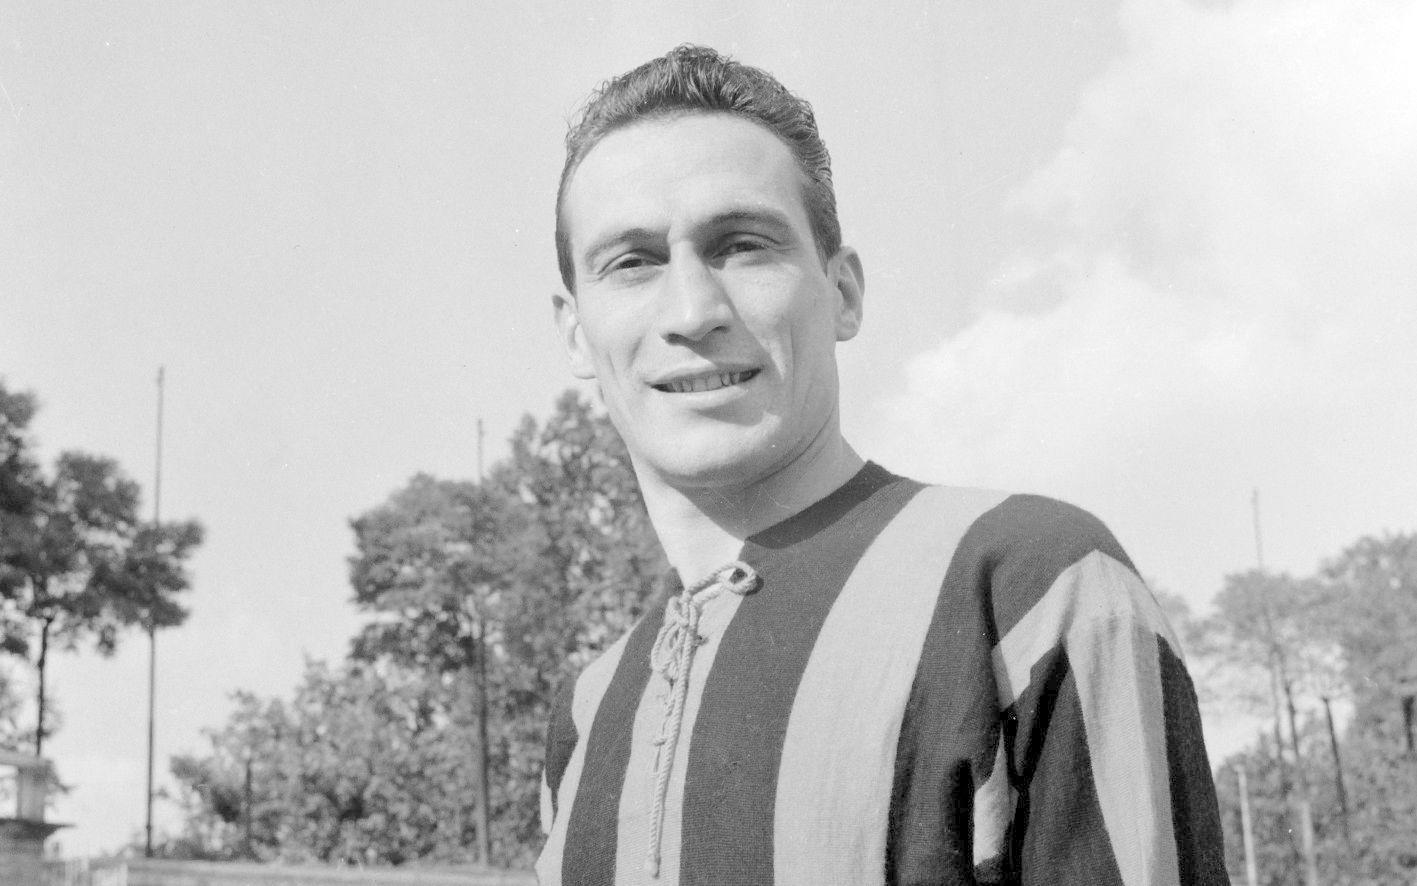 Enzo Bearzot, world champion and born Inter fan | News